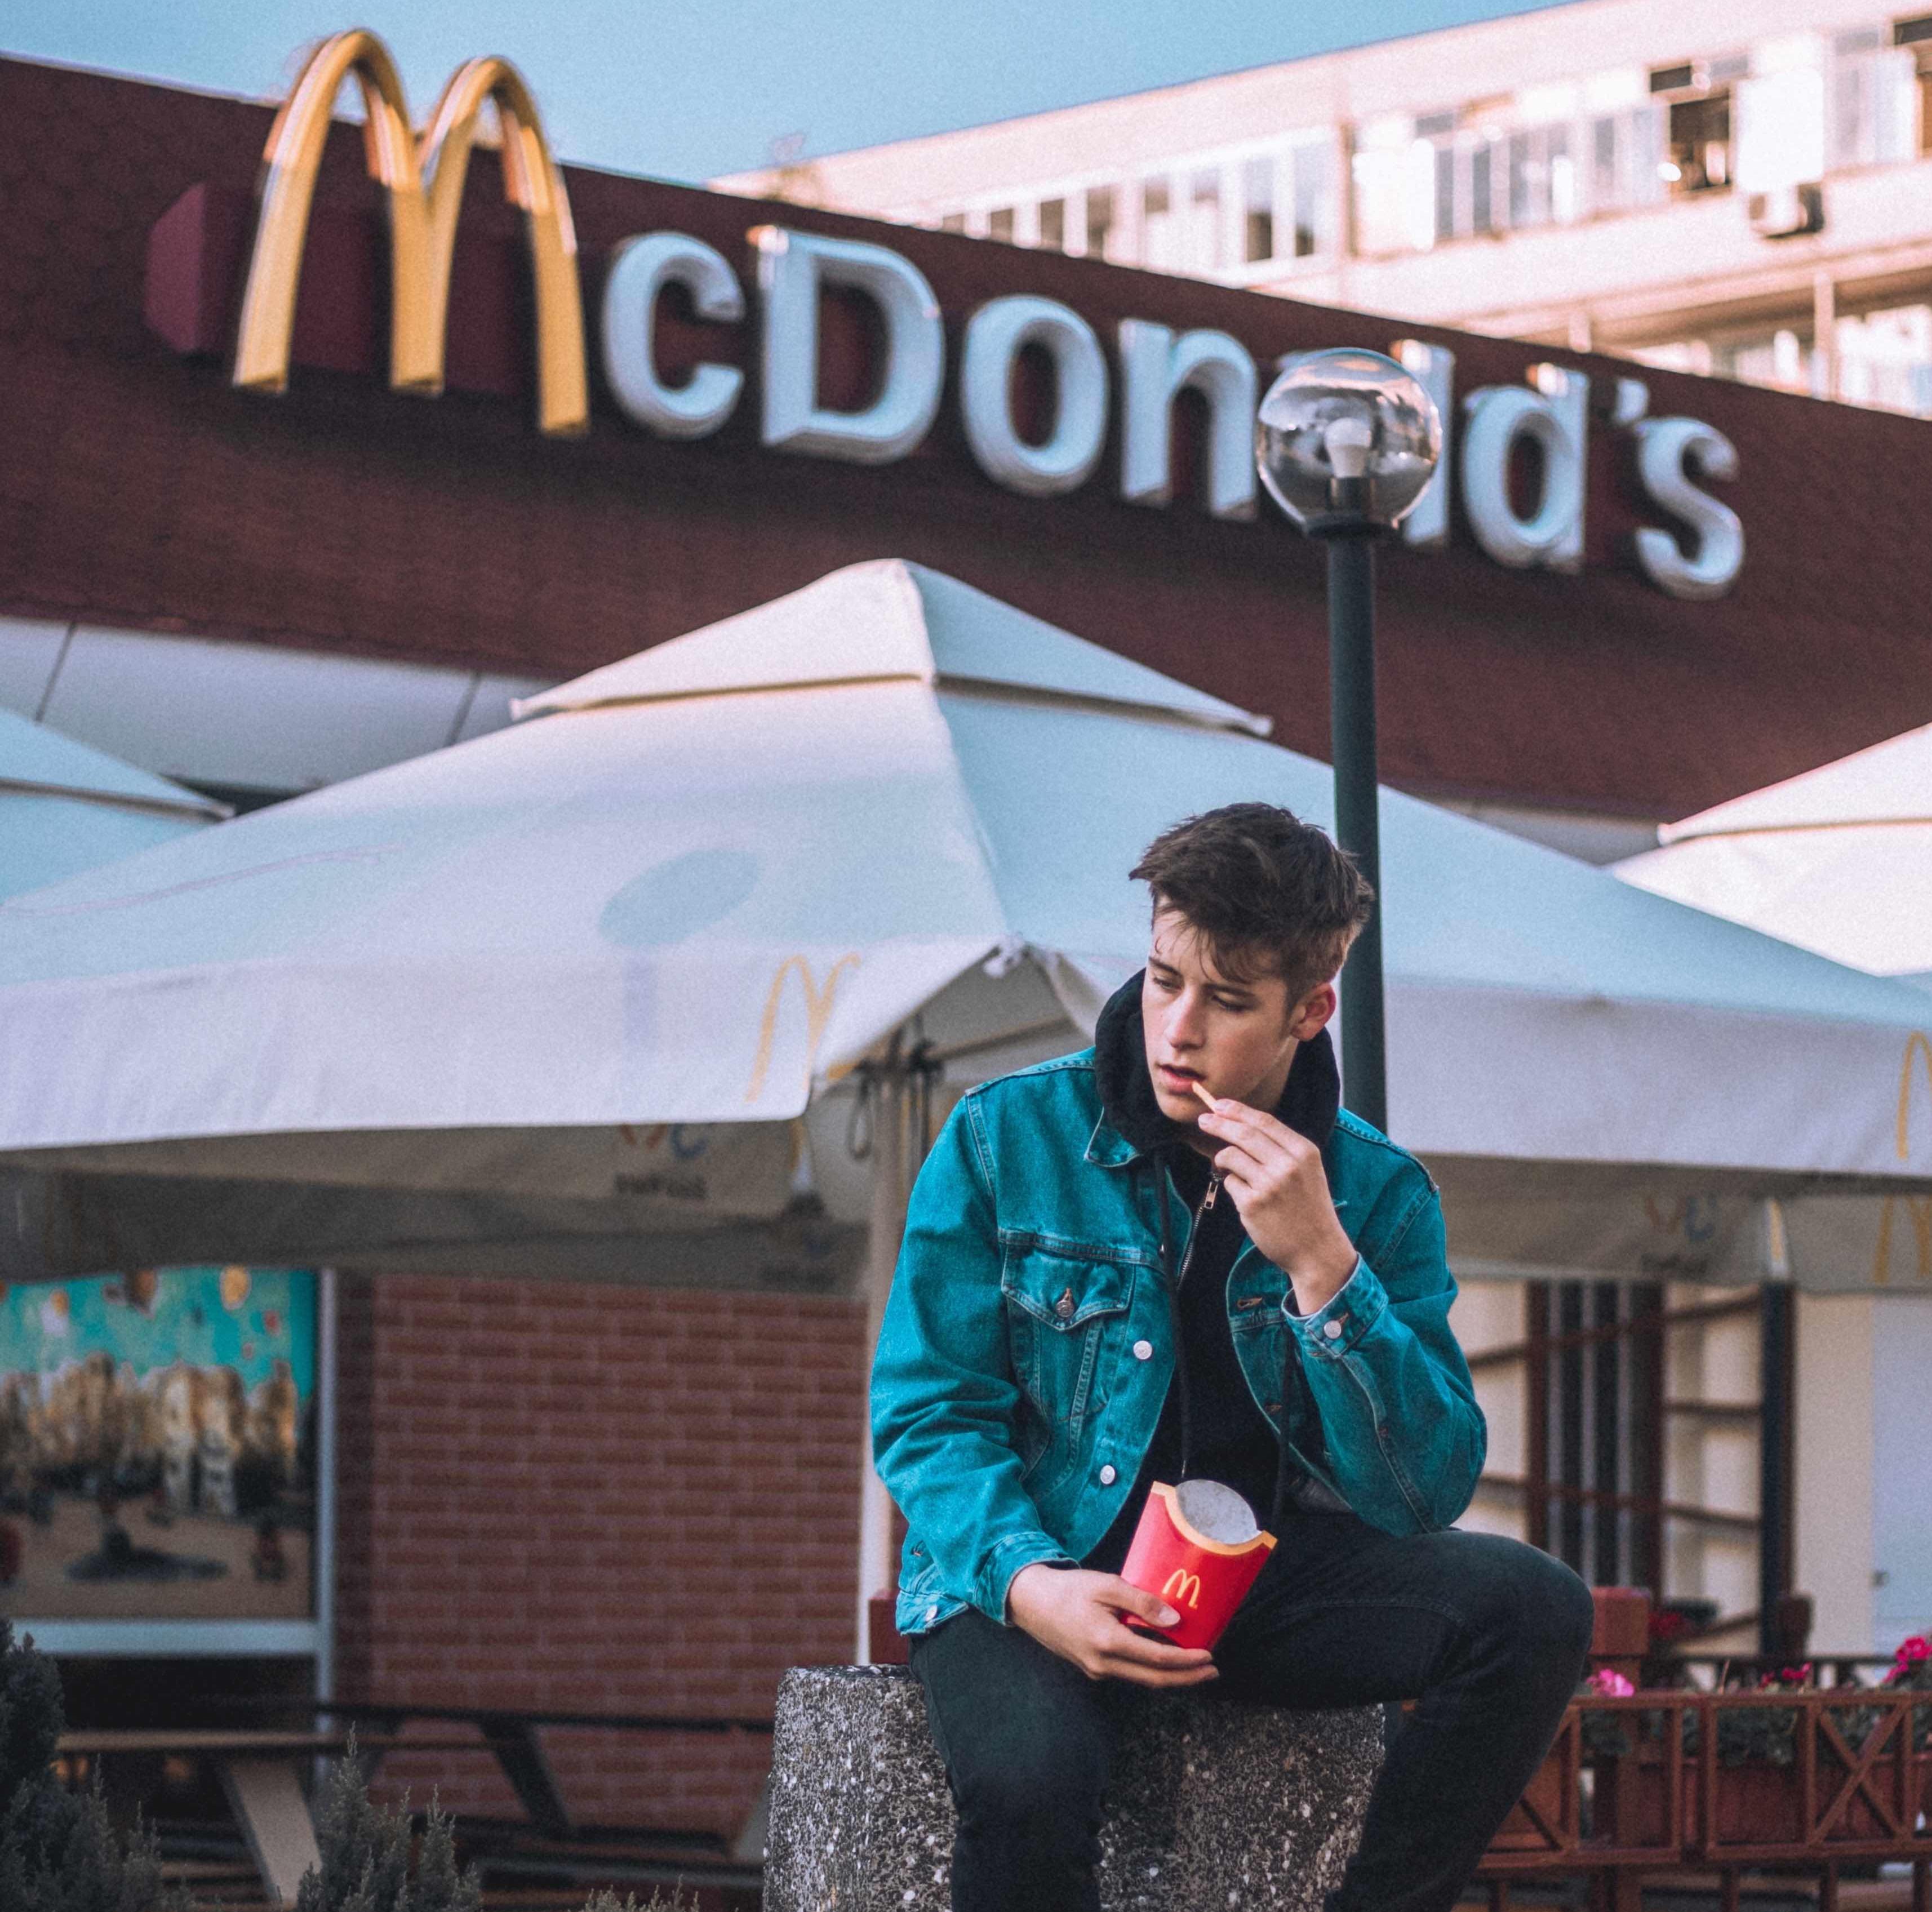 legacy fast food brand